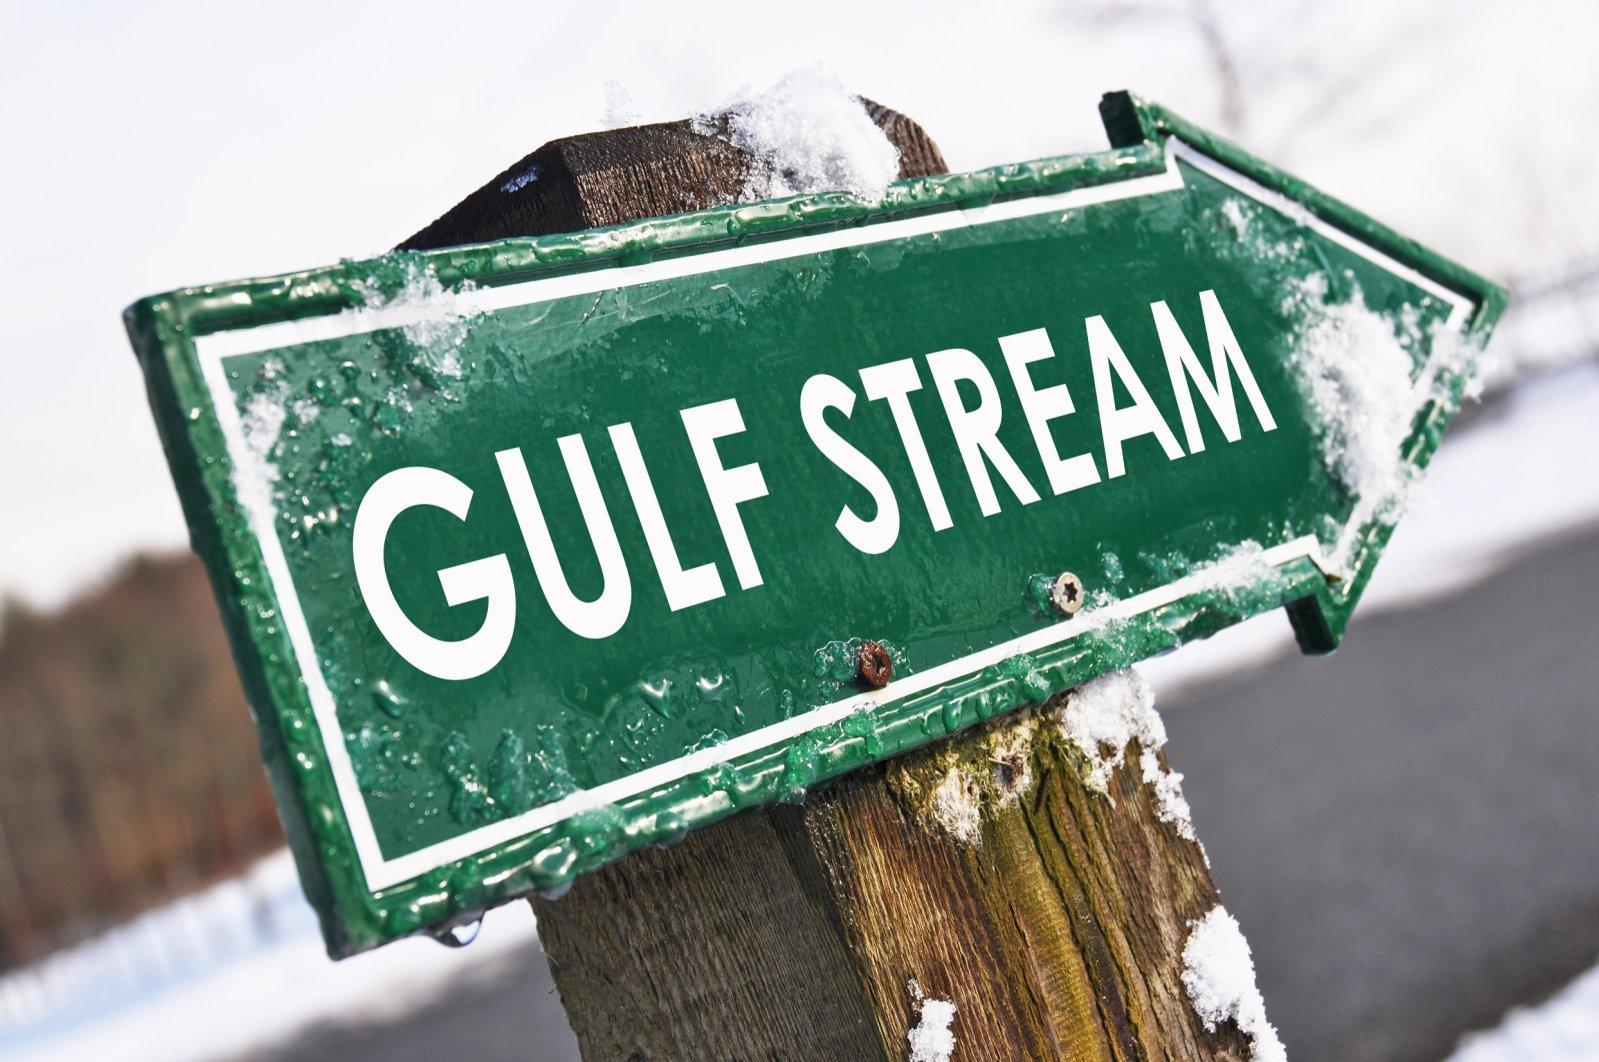 The Gulf stream road sign. (Shutterstock Photo)